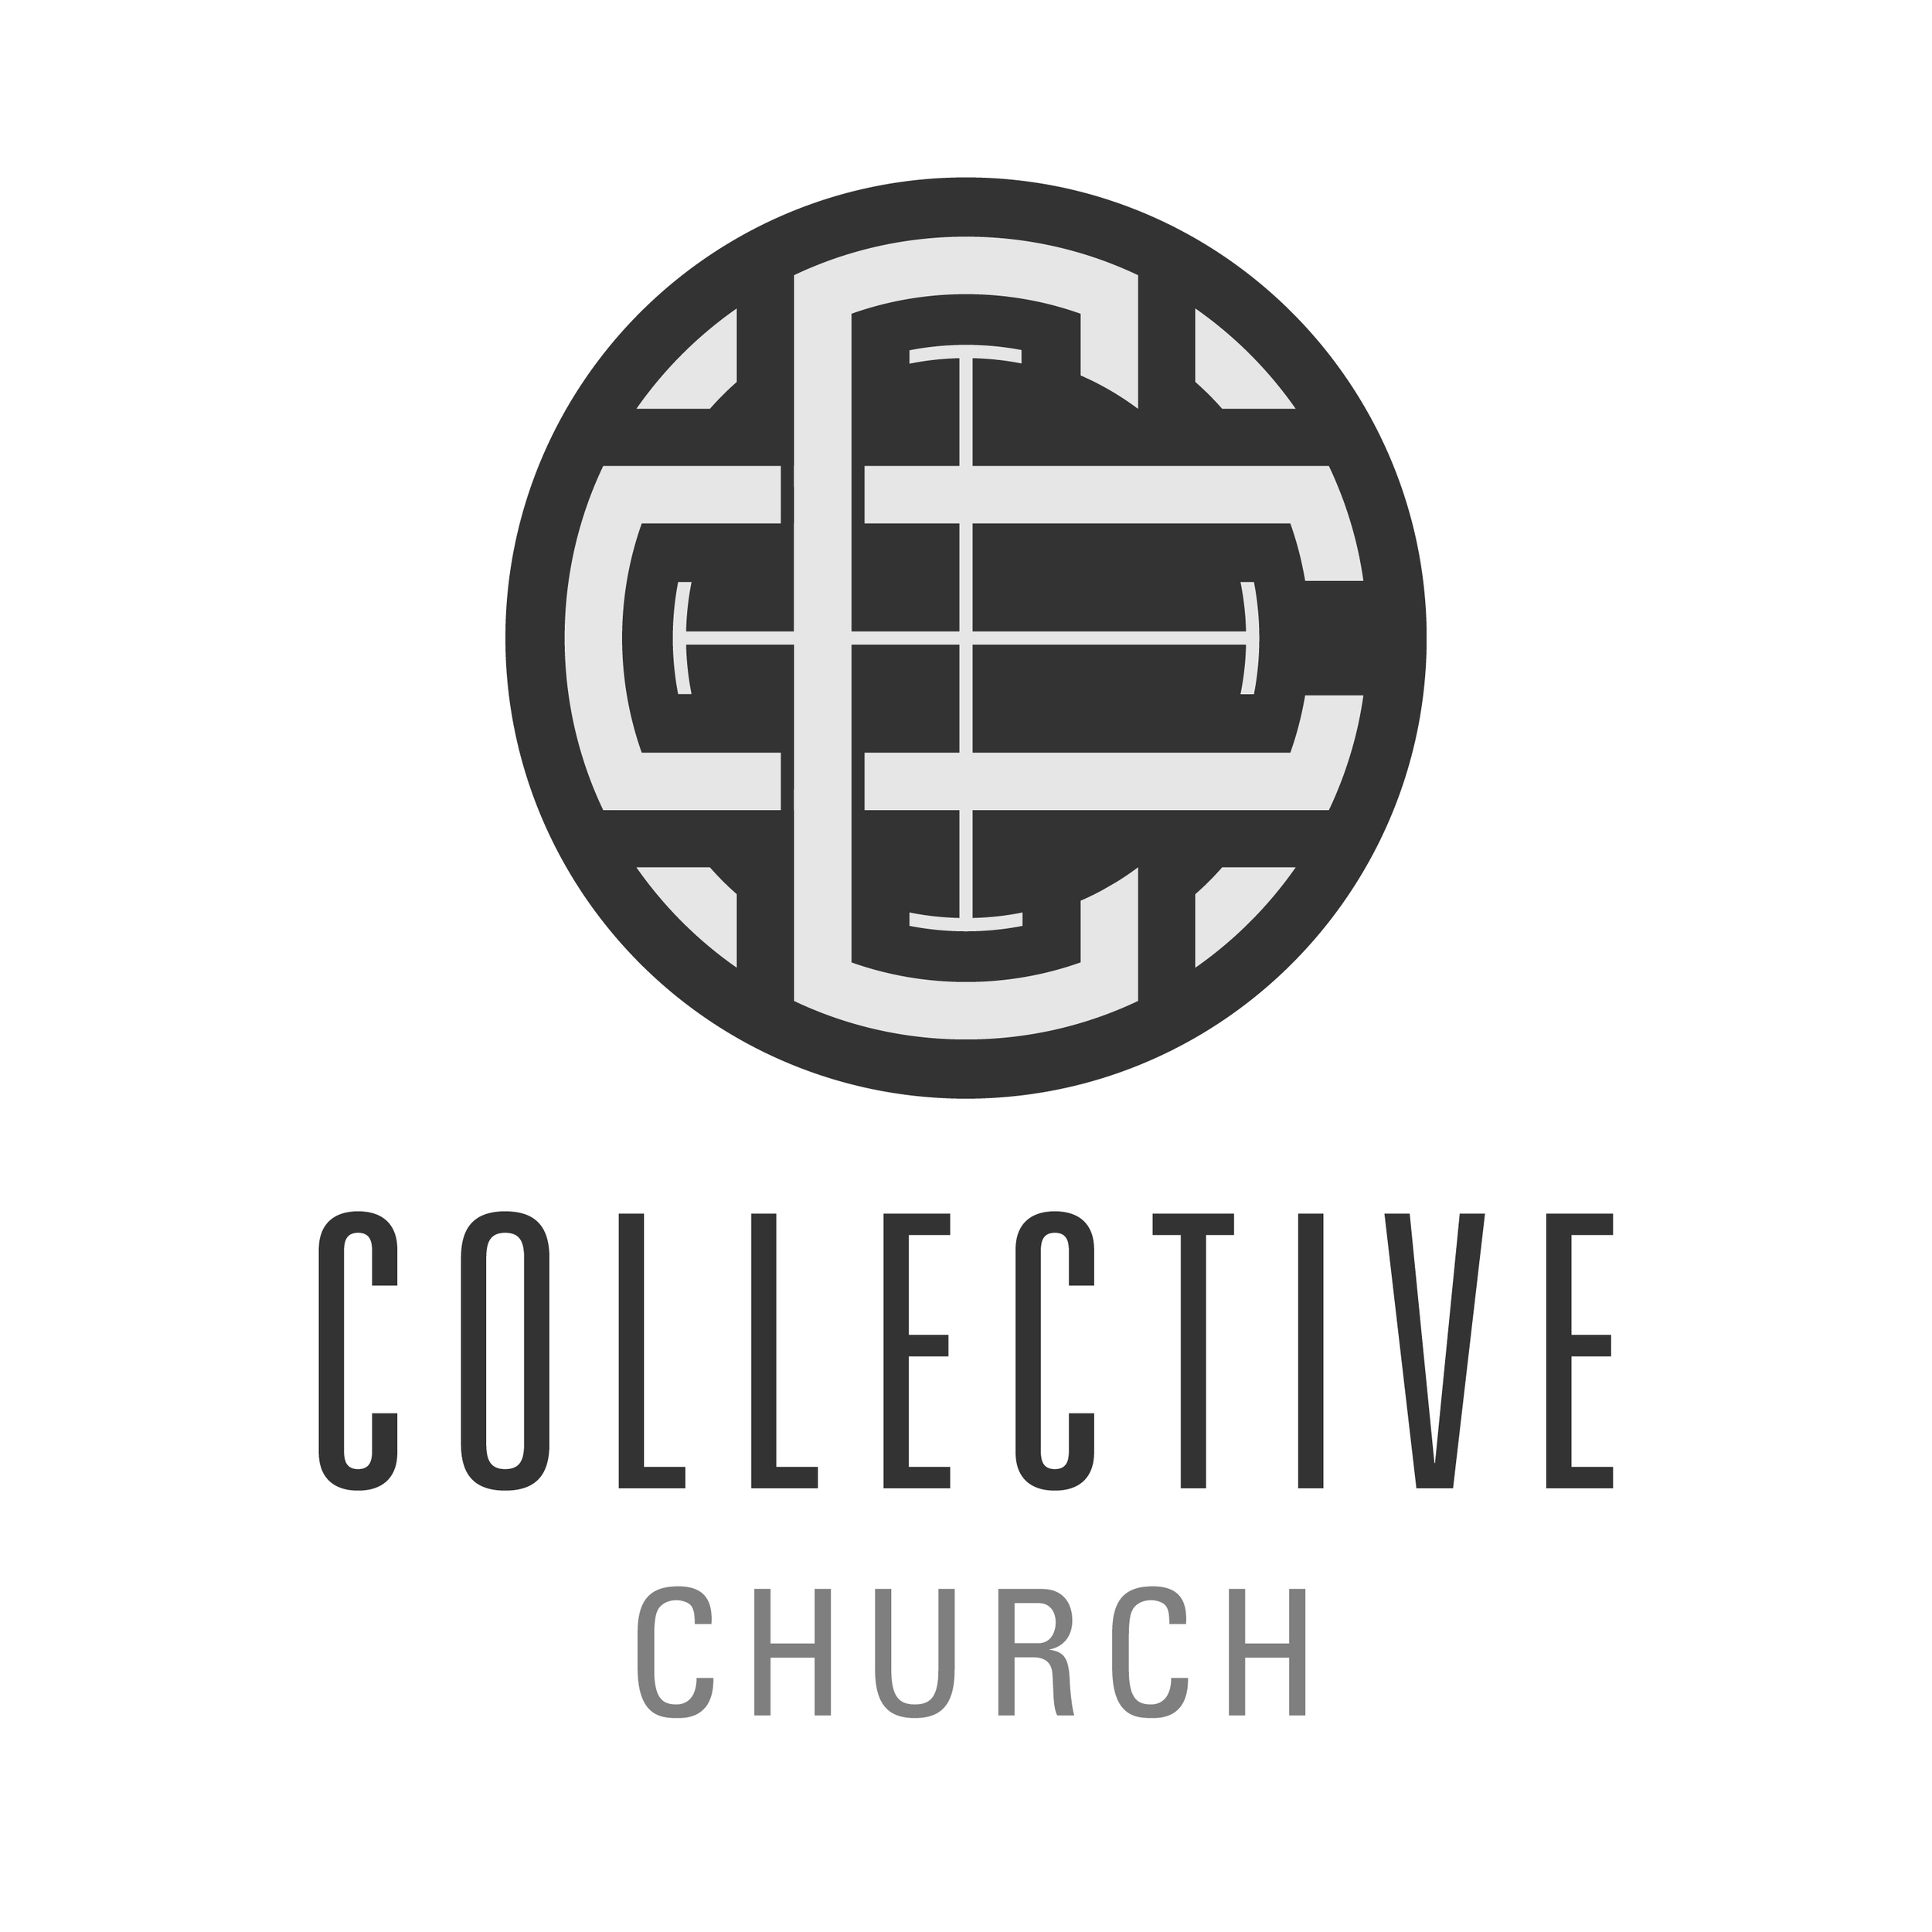 collective_church_1 vert logo.jpg